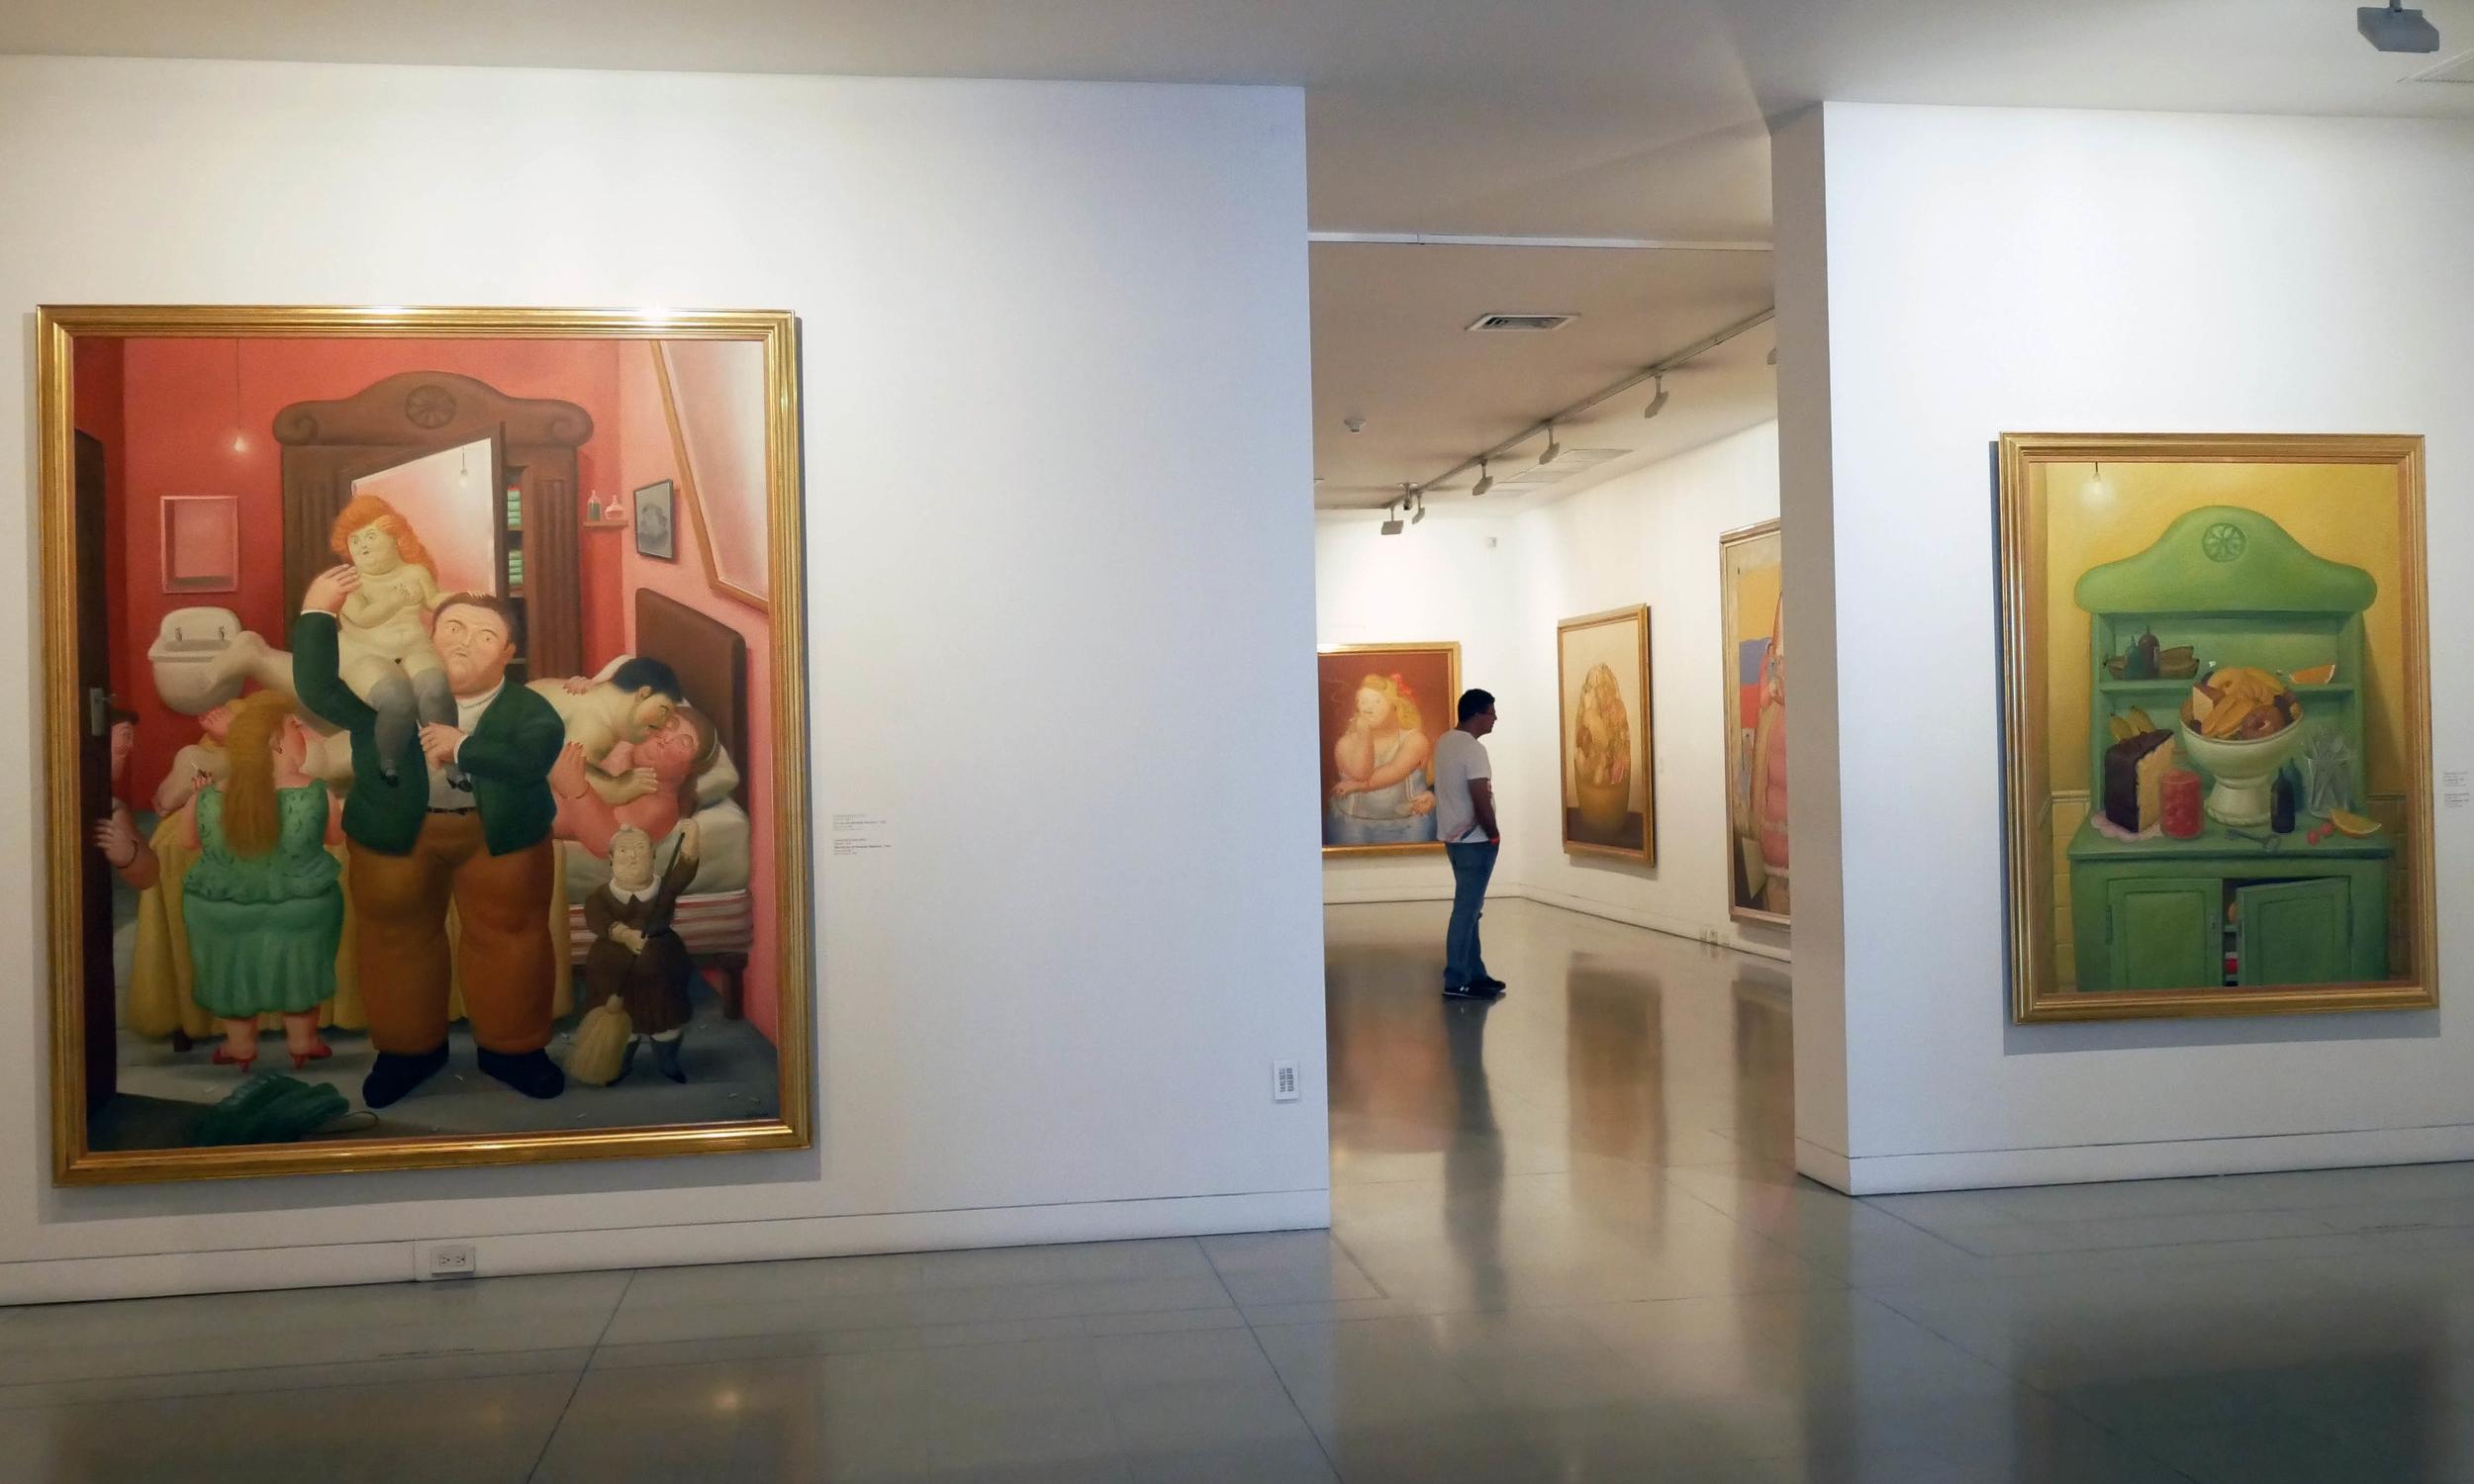 Botero paintings in the Museo de Antioquia